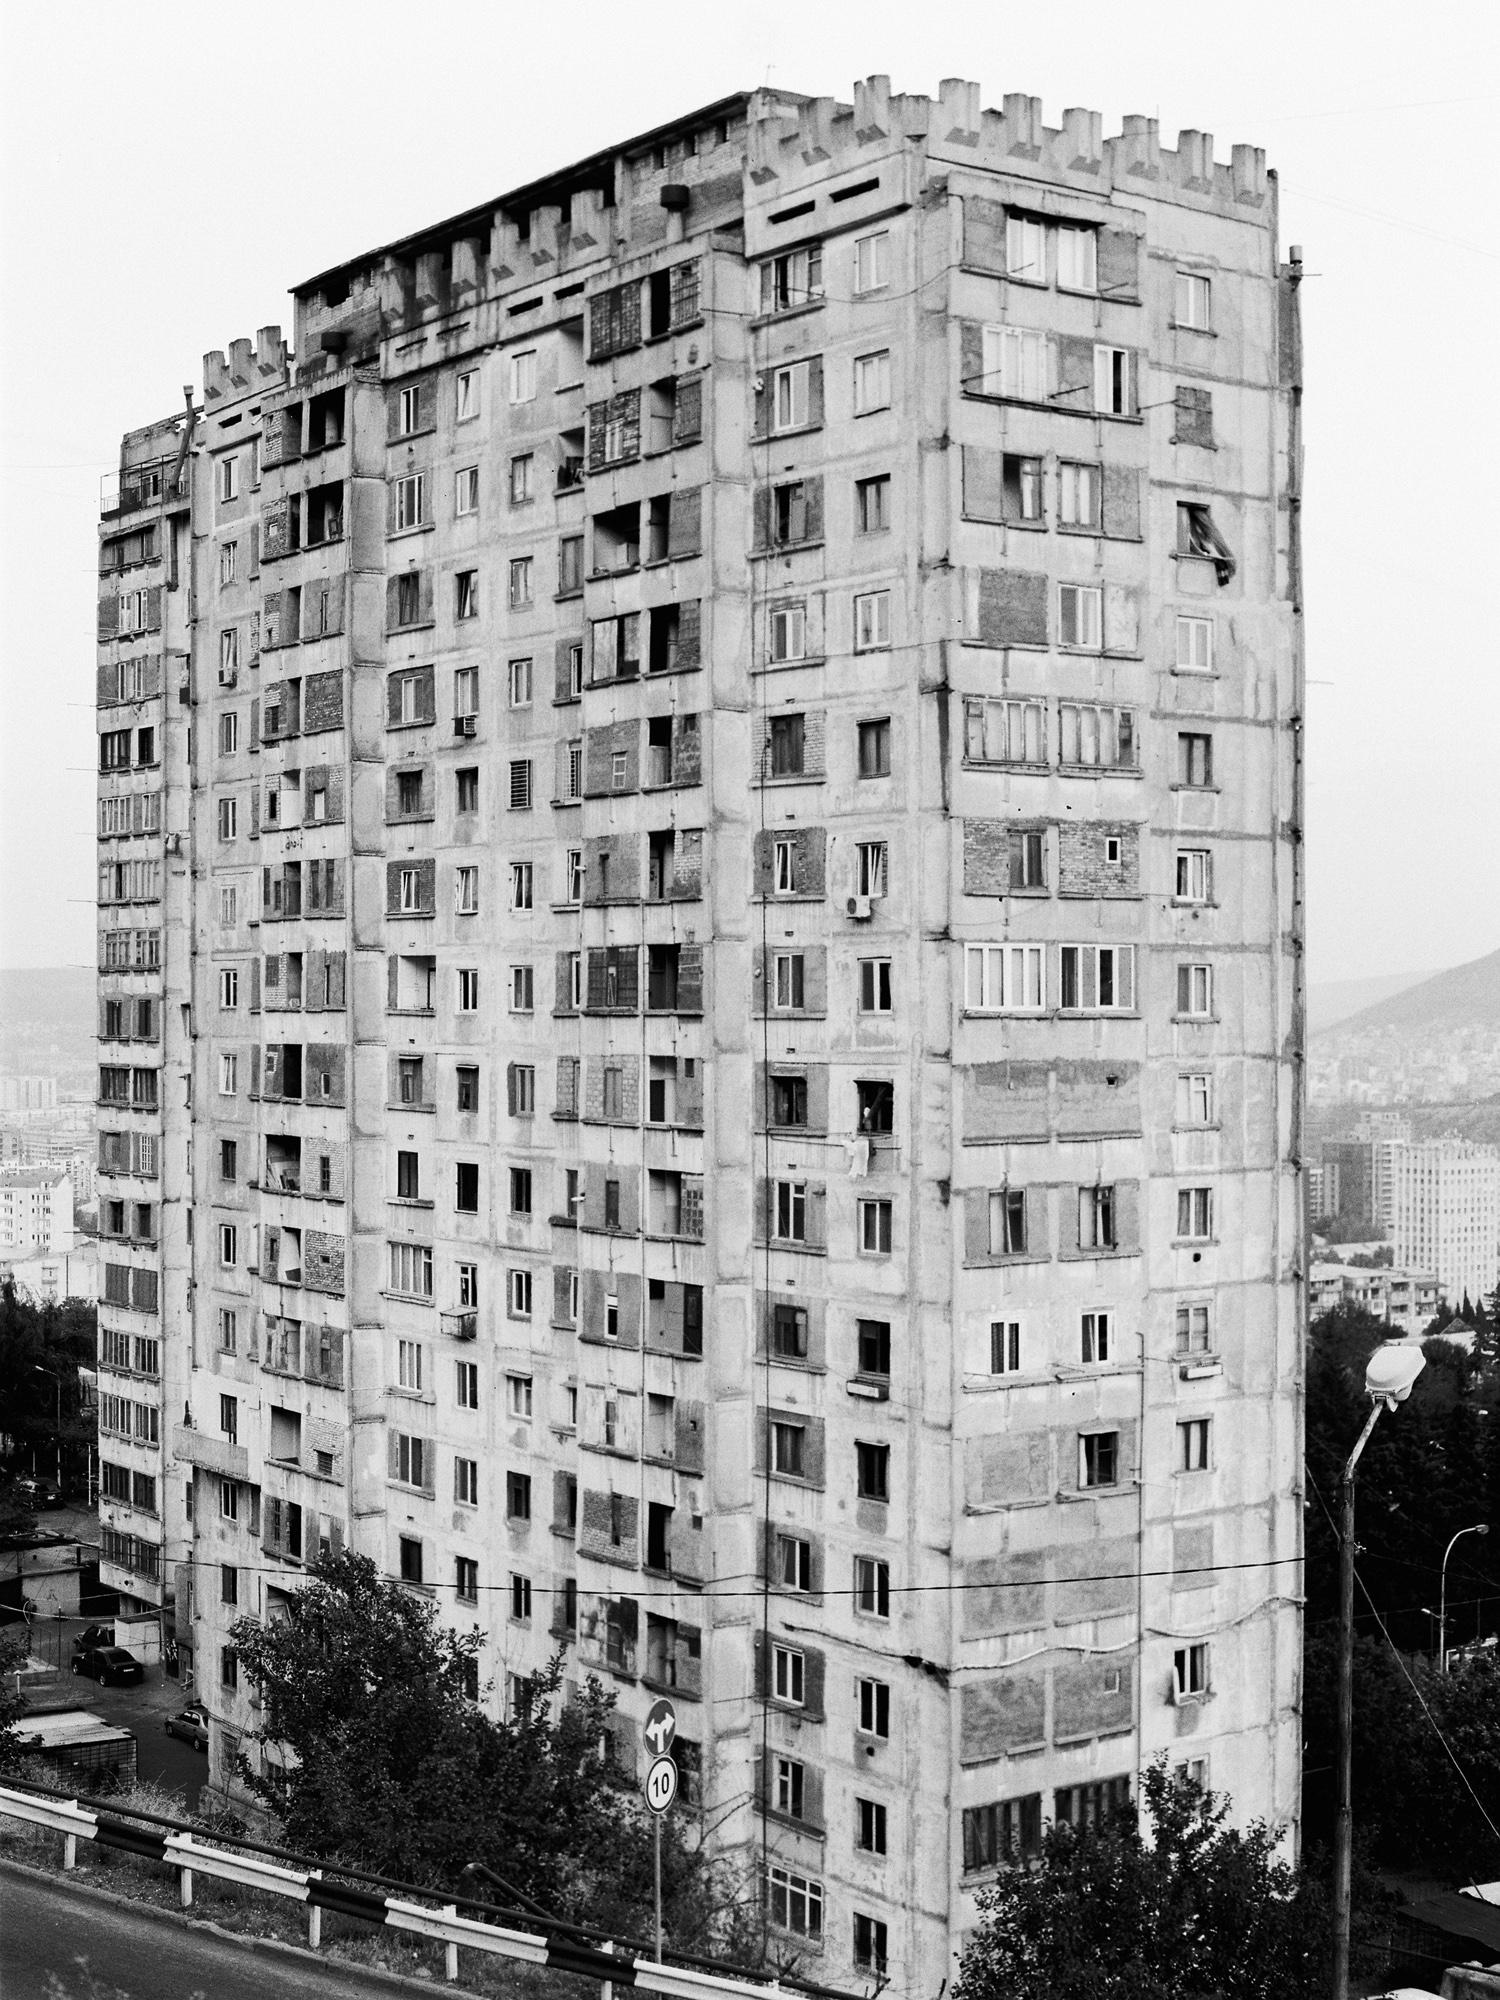 Tbilisi_2015_Kodak_Tri-x_7_1.jpg